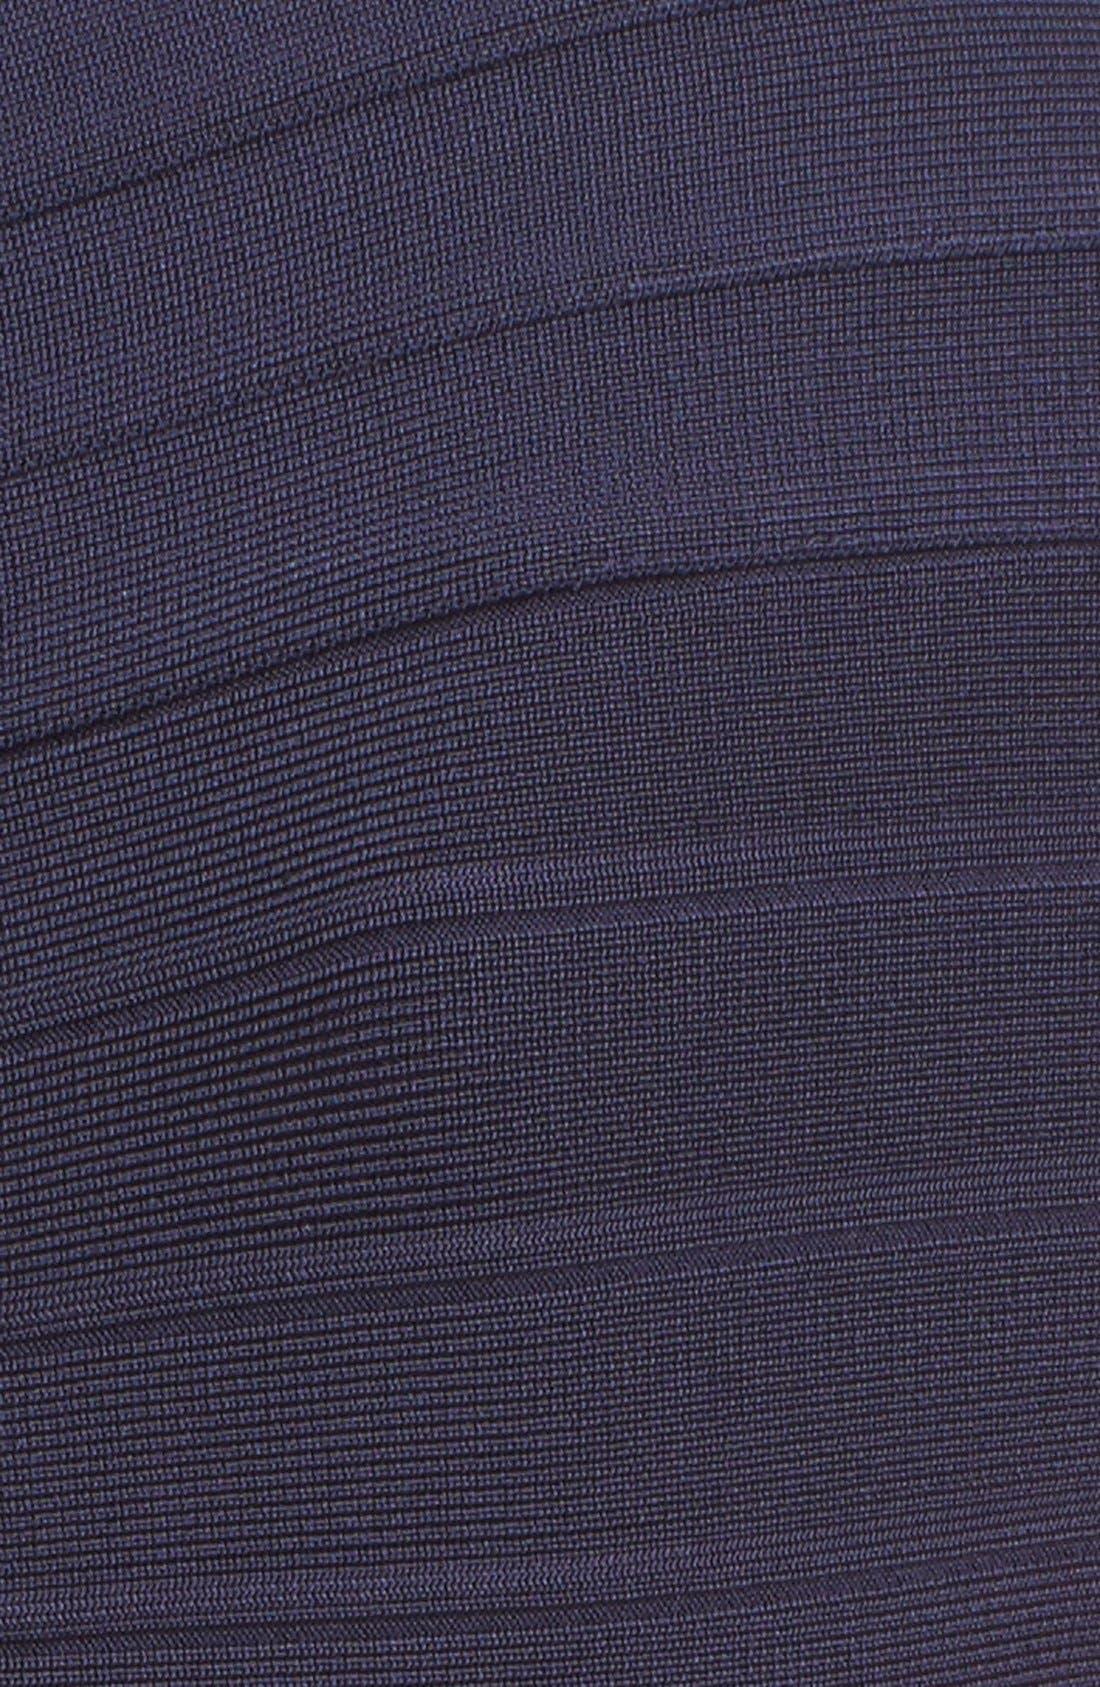 HERVE LEGER,                             'Catarina' Mermaid Bandage Gown,                             Alternate thumbnail 4, color,                             419